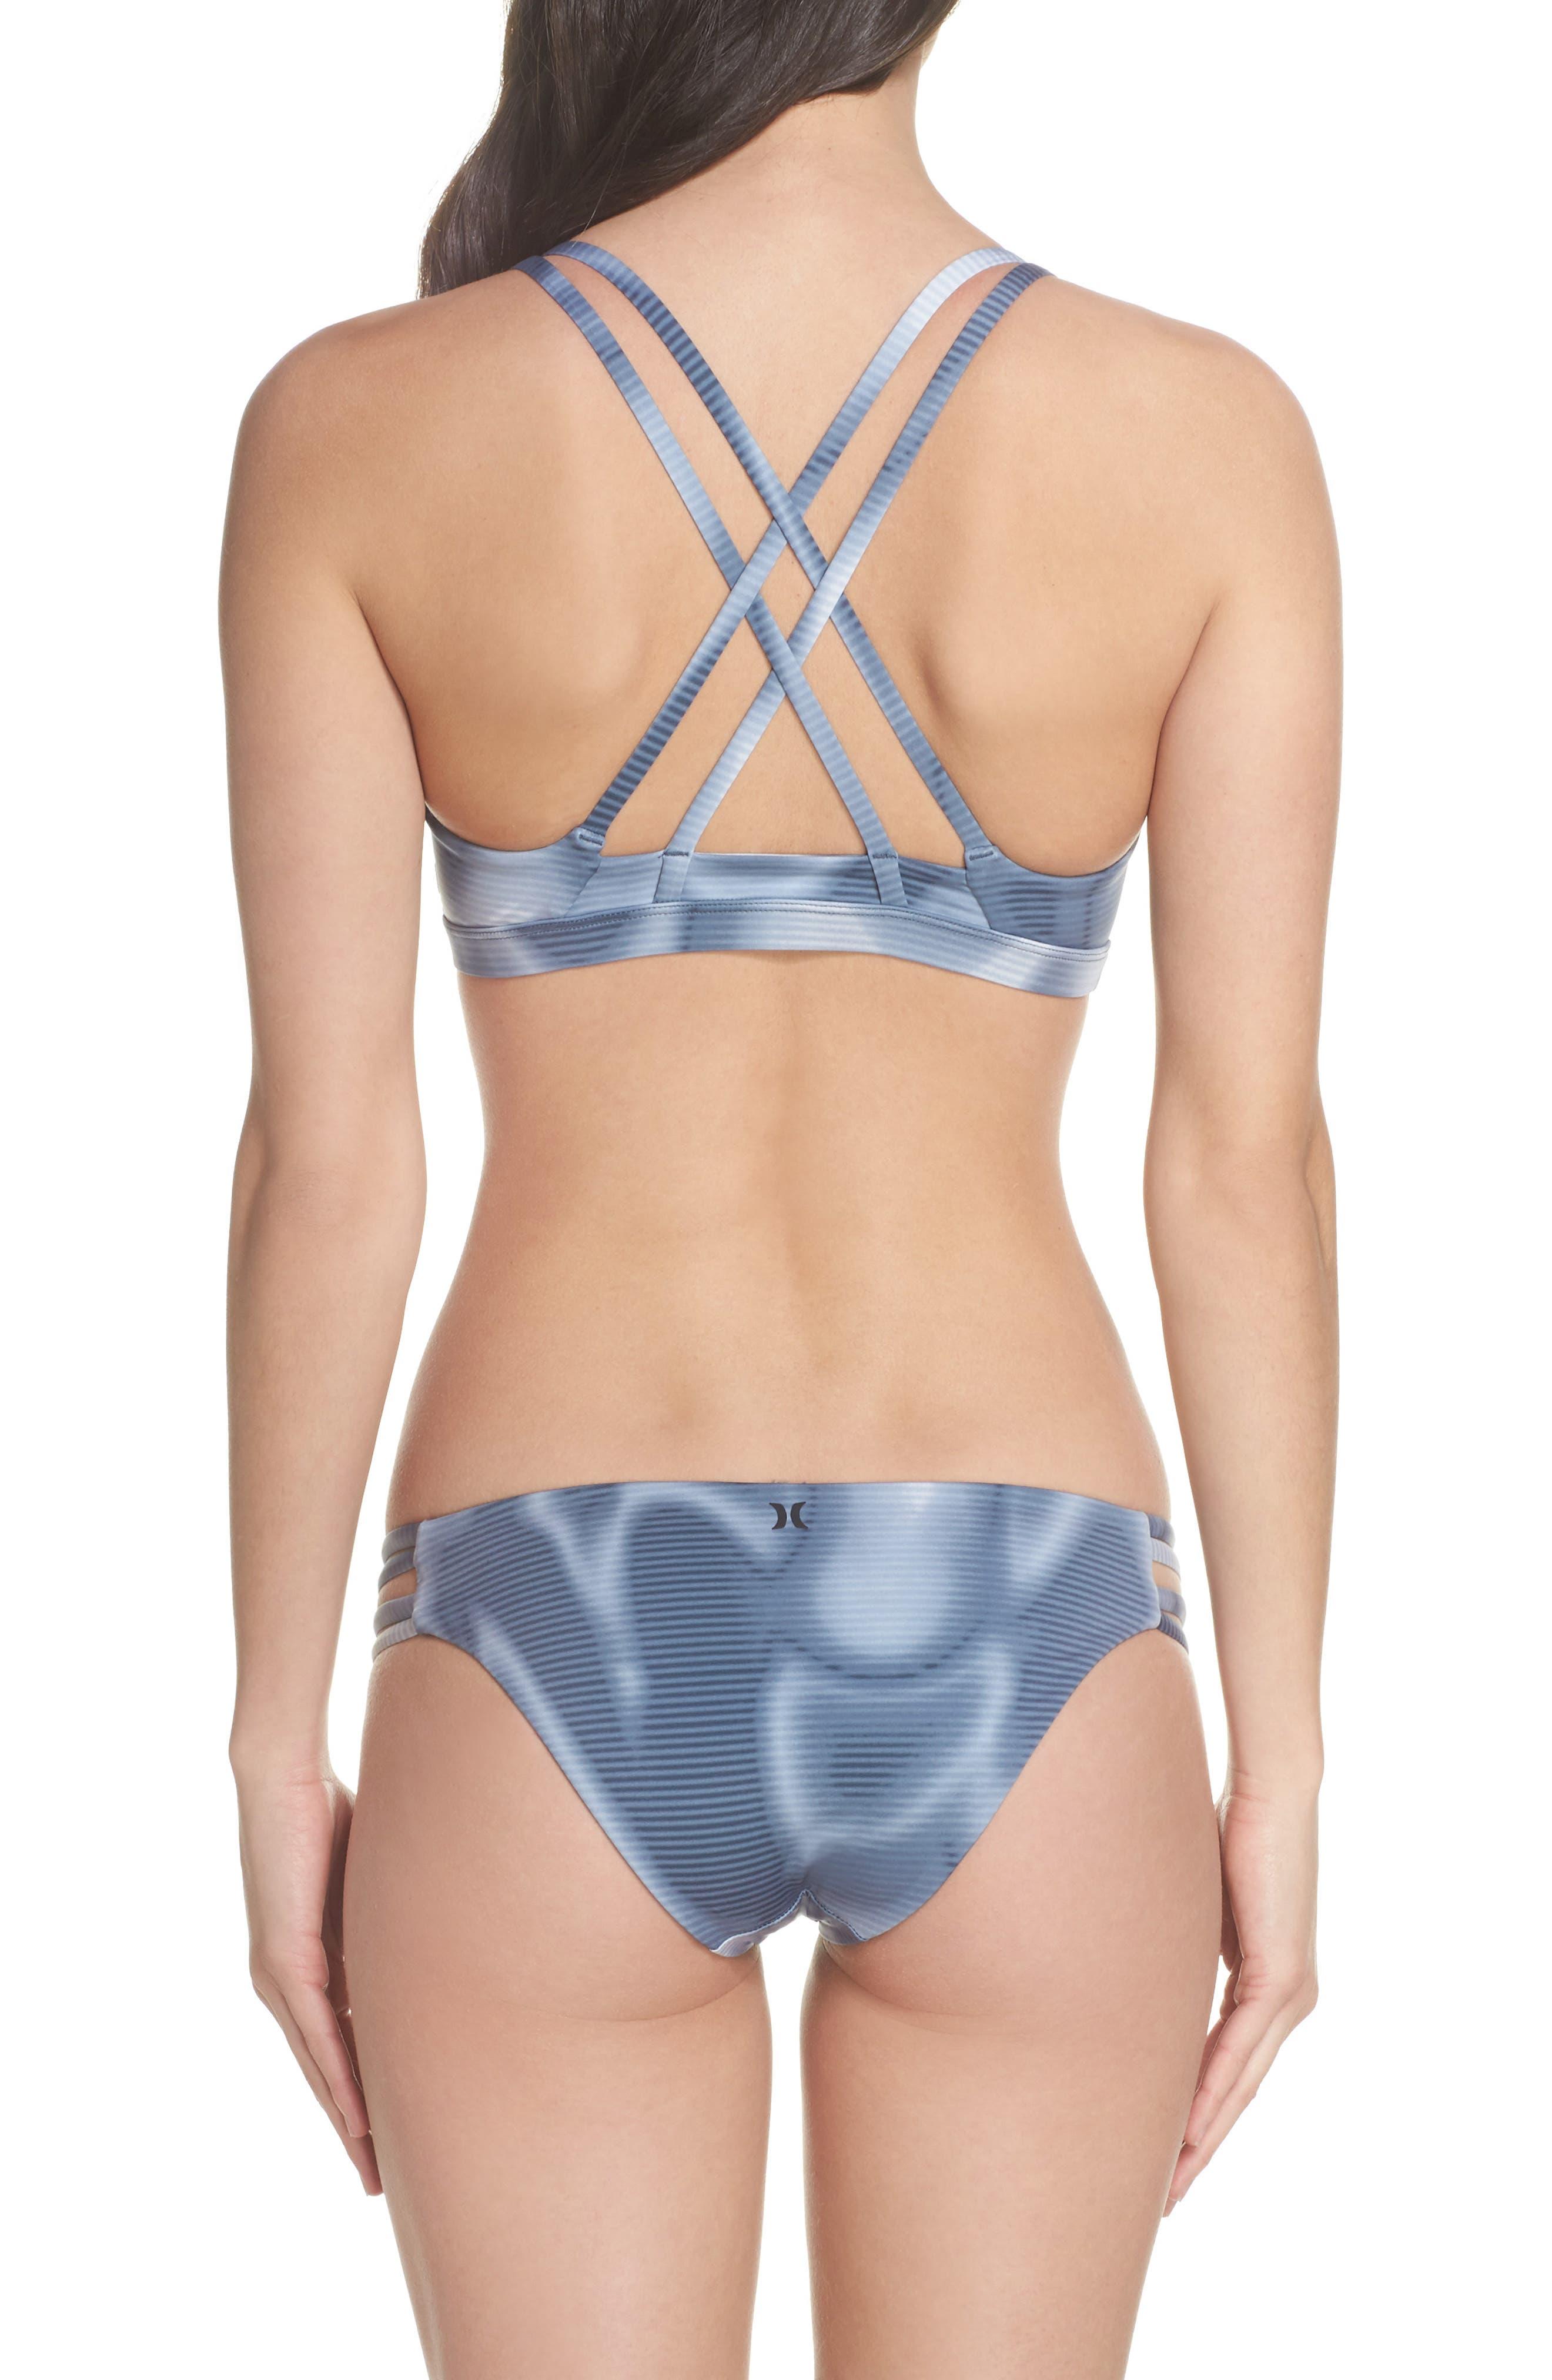 Quick Dry Max Waves Bikini Top,                             Alternate thumbnail 6, color,                             Squadron Blue